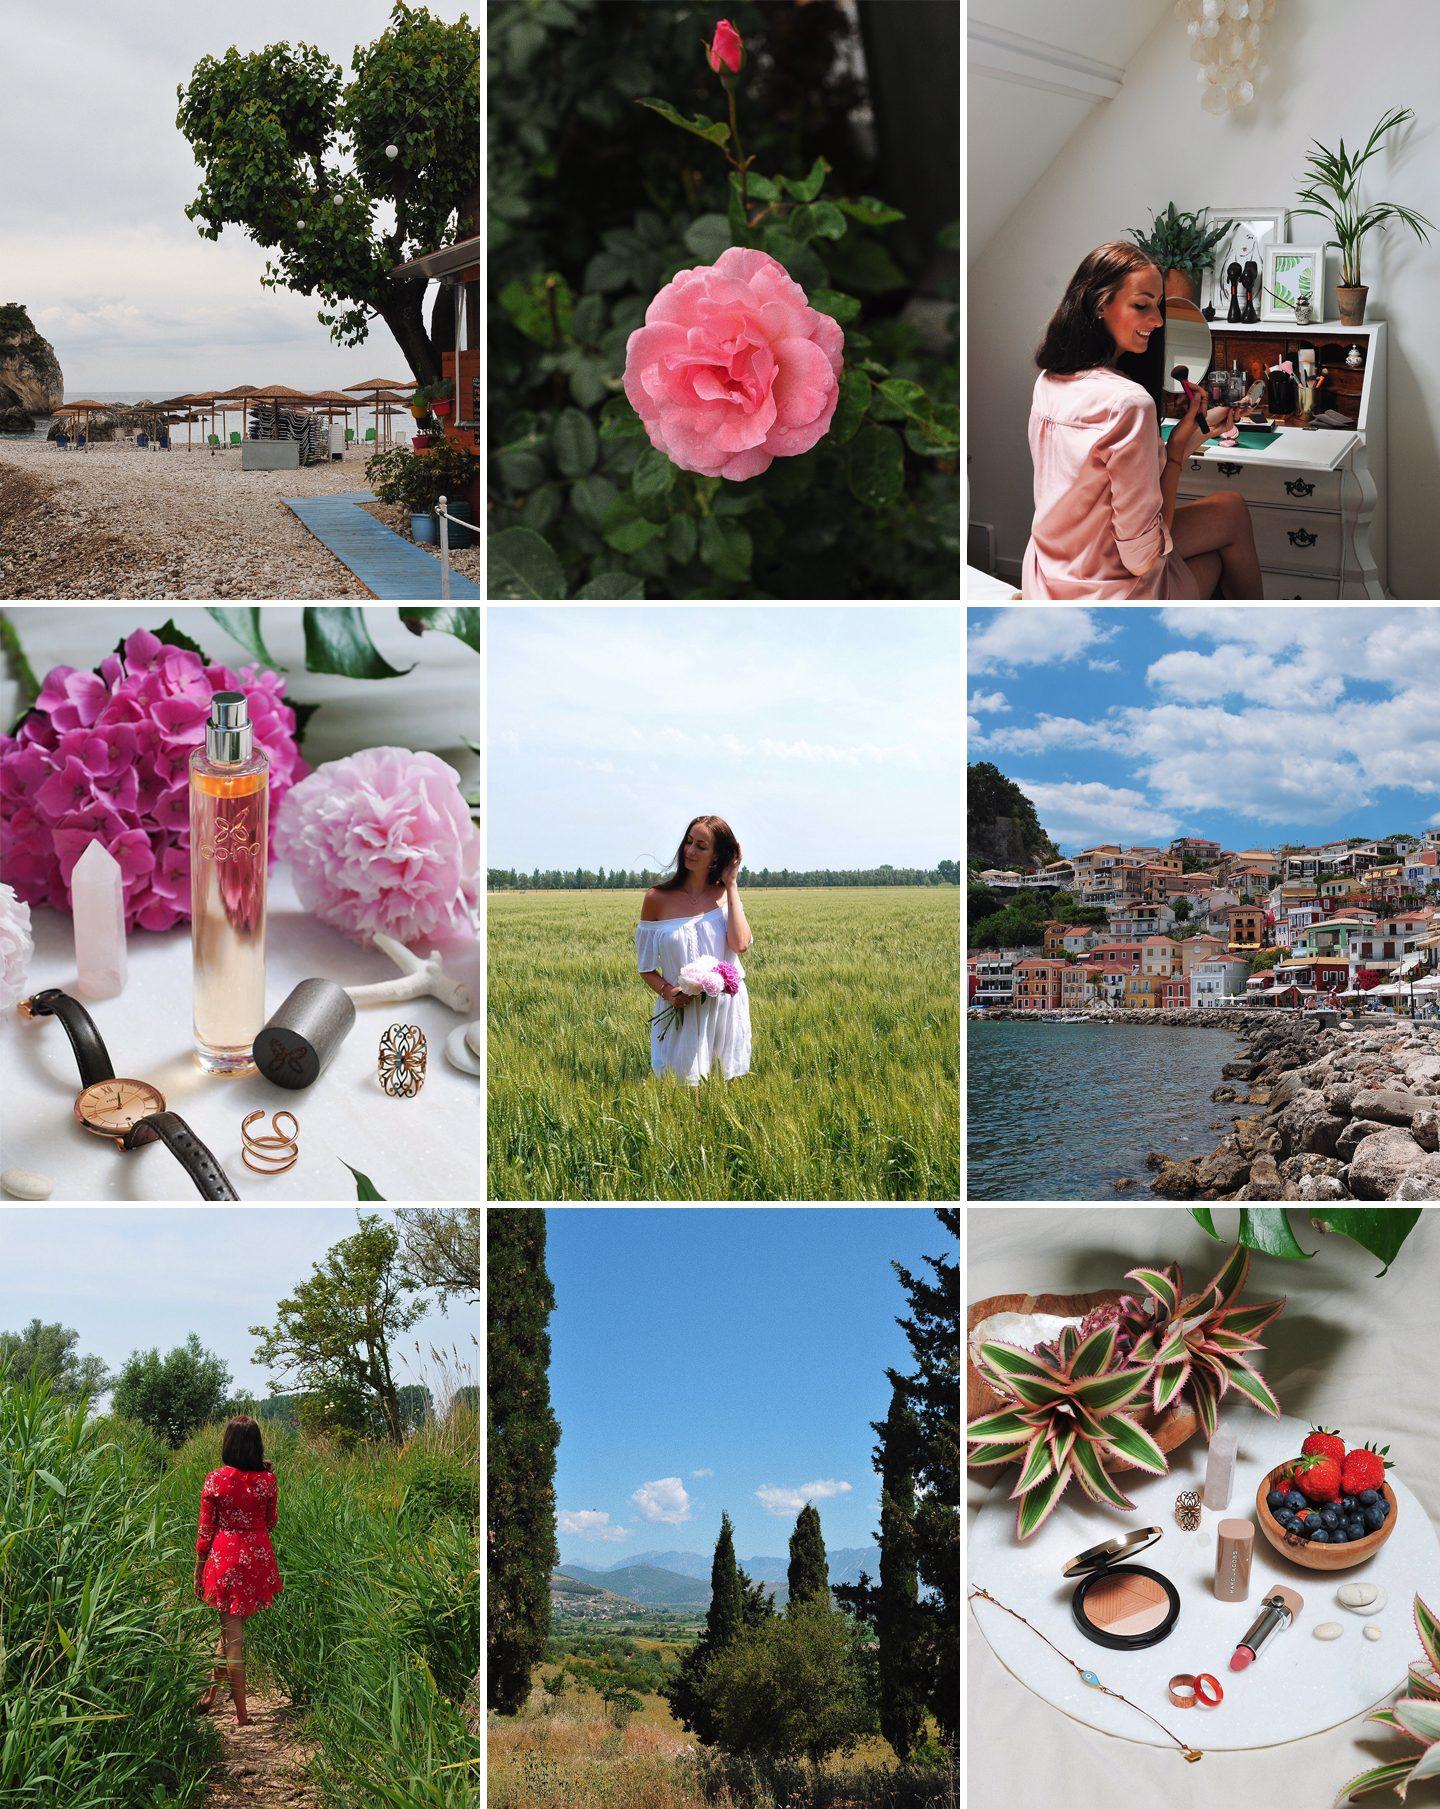 Instagram Best 9 lifestyle by linda